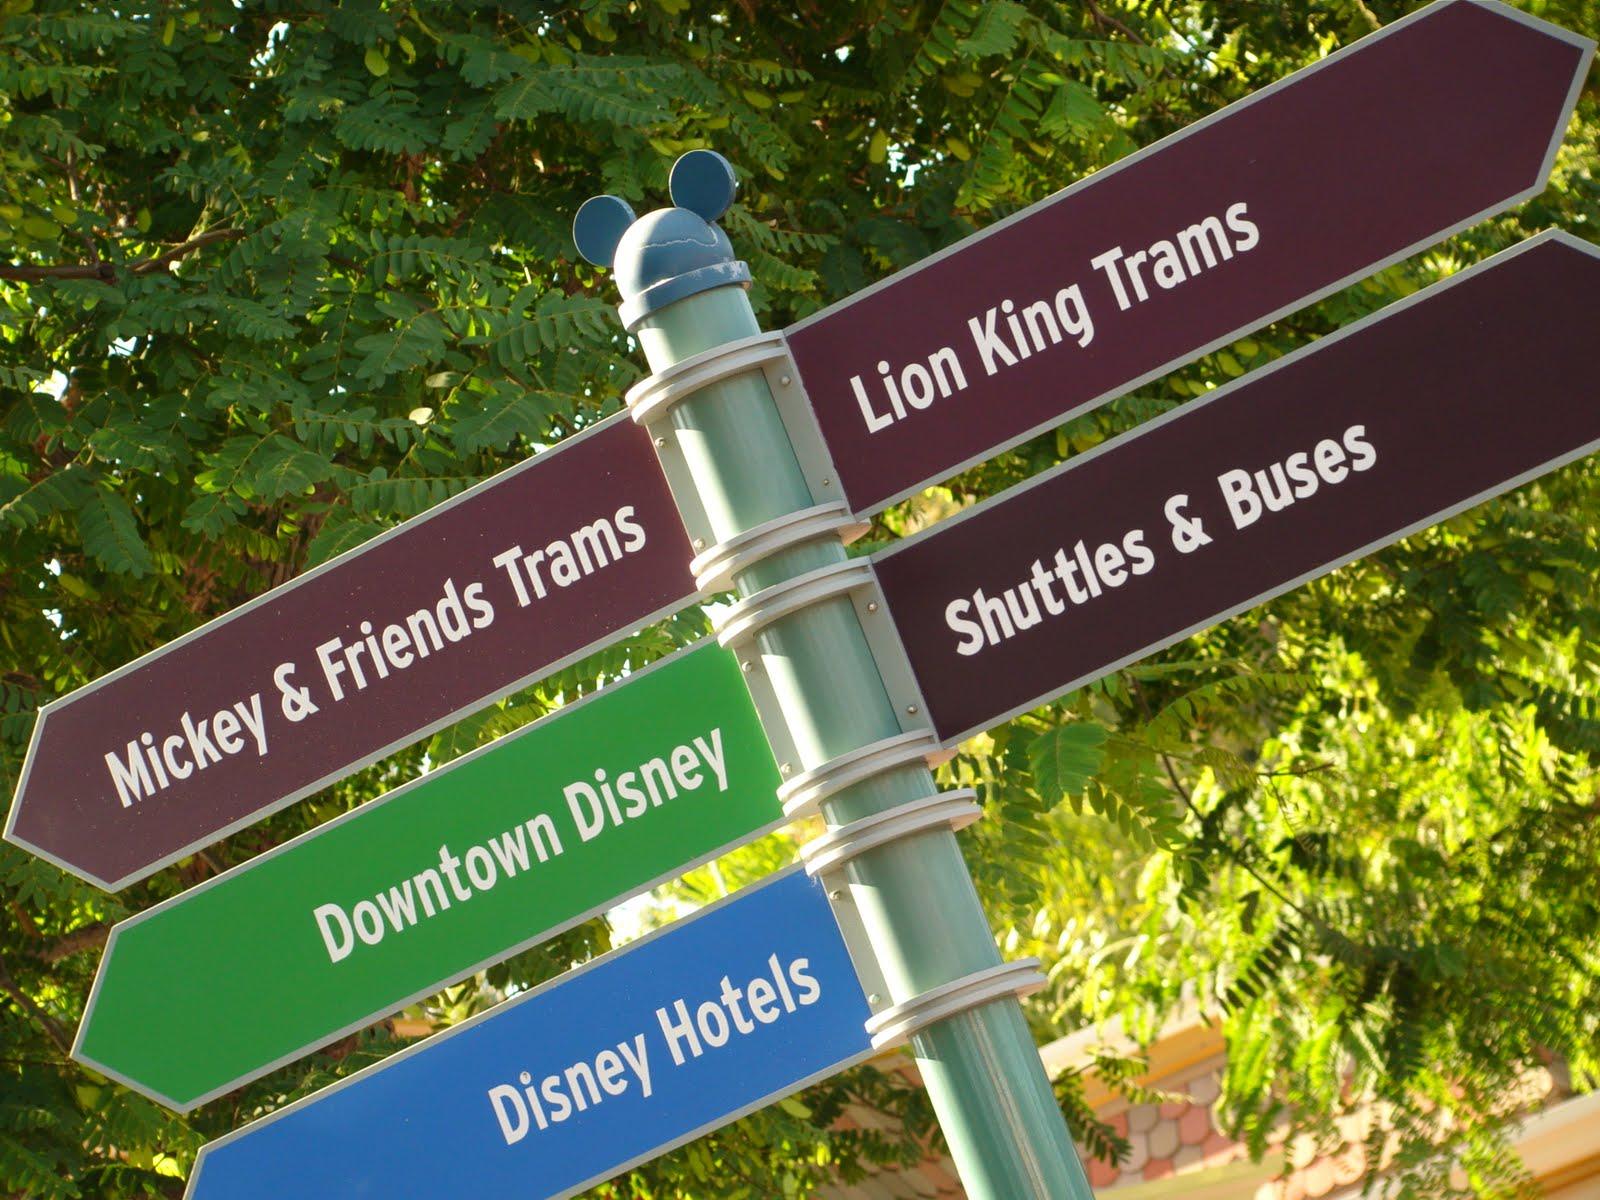 Disneyland Resort S Top Spots For Toddlers